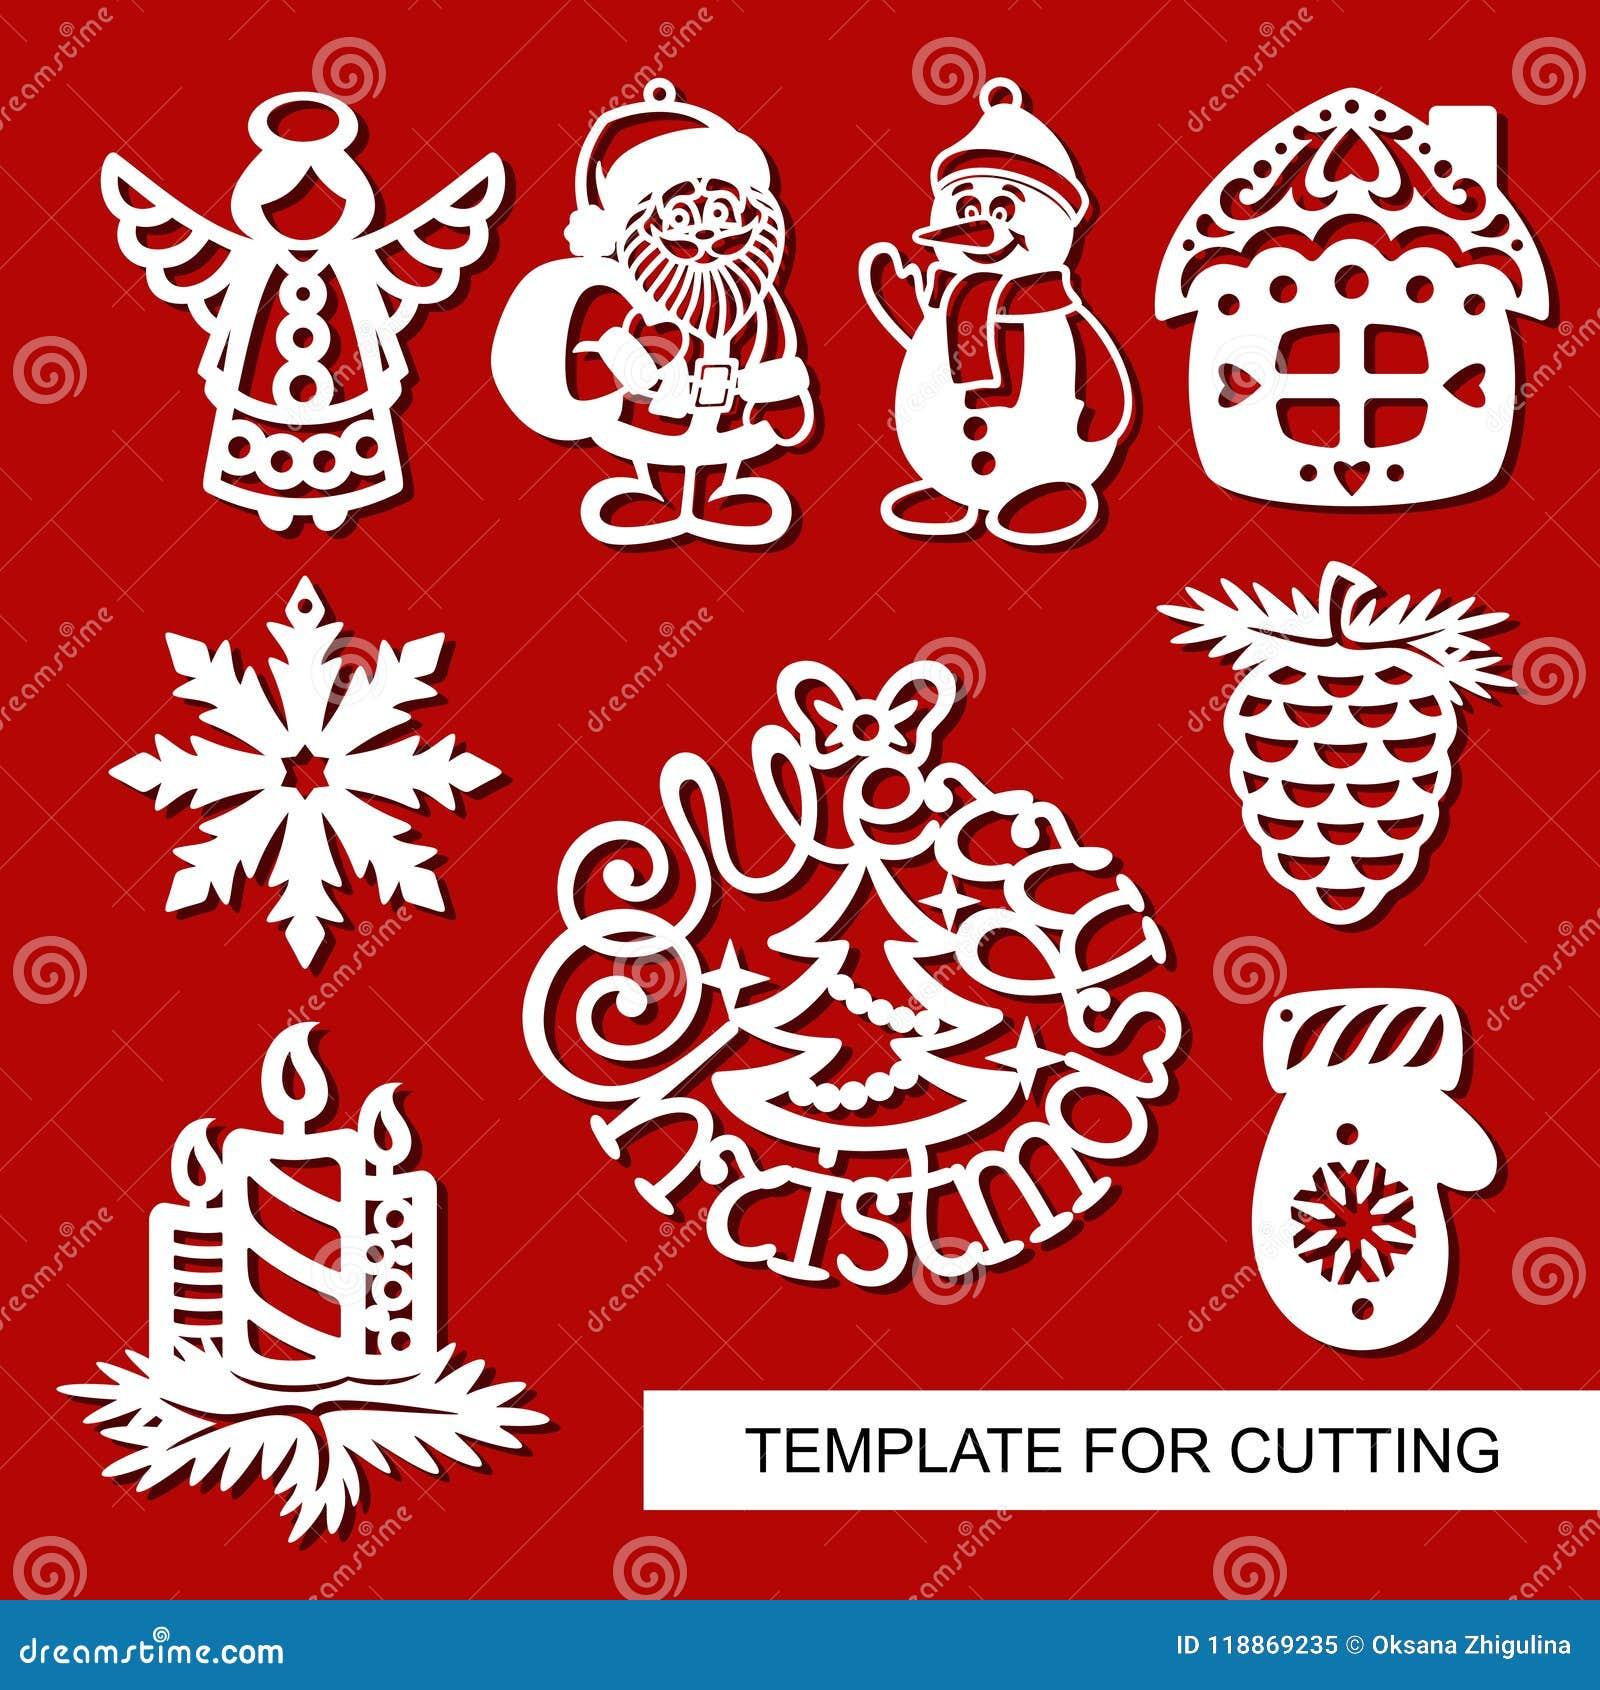 Christmas Cutout Patterns.Set Of Christmas Decoration Silhouettes Of Angel Santa